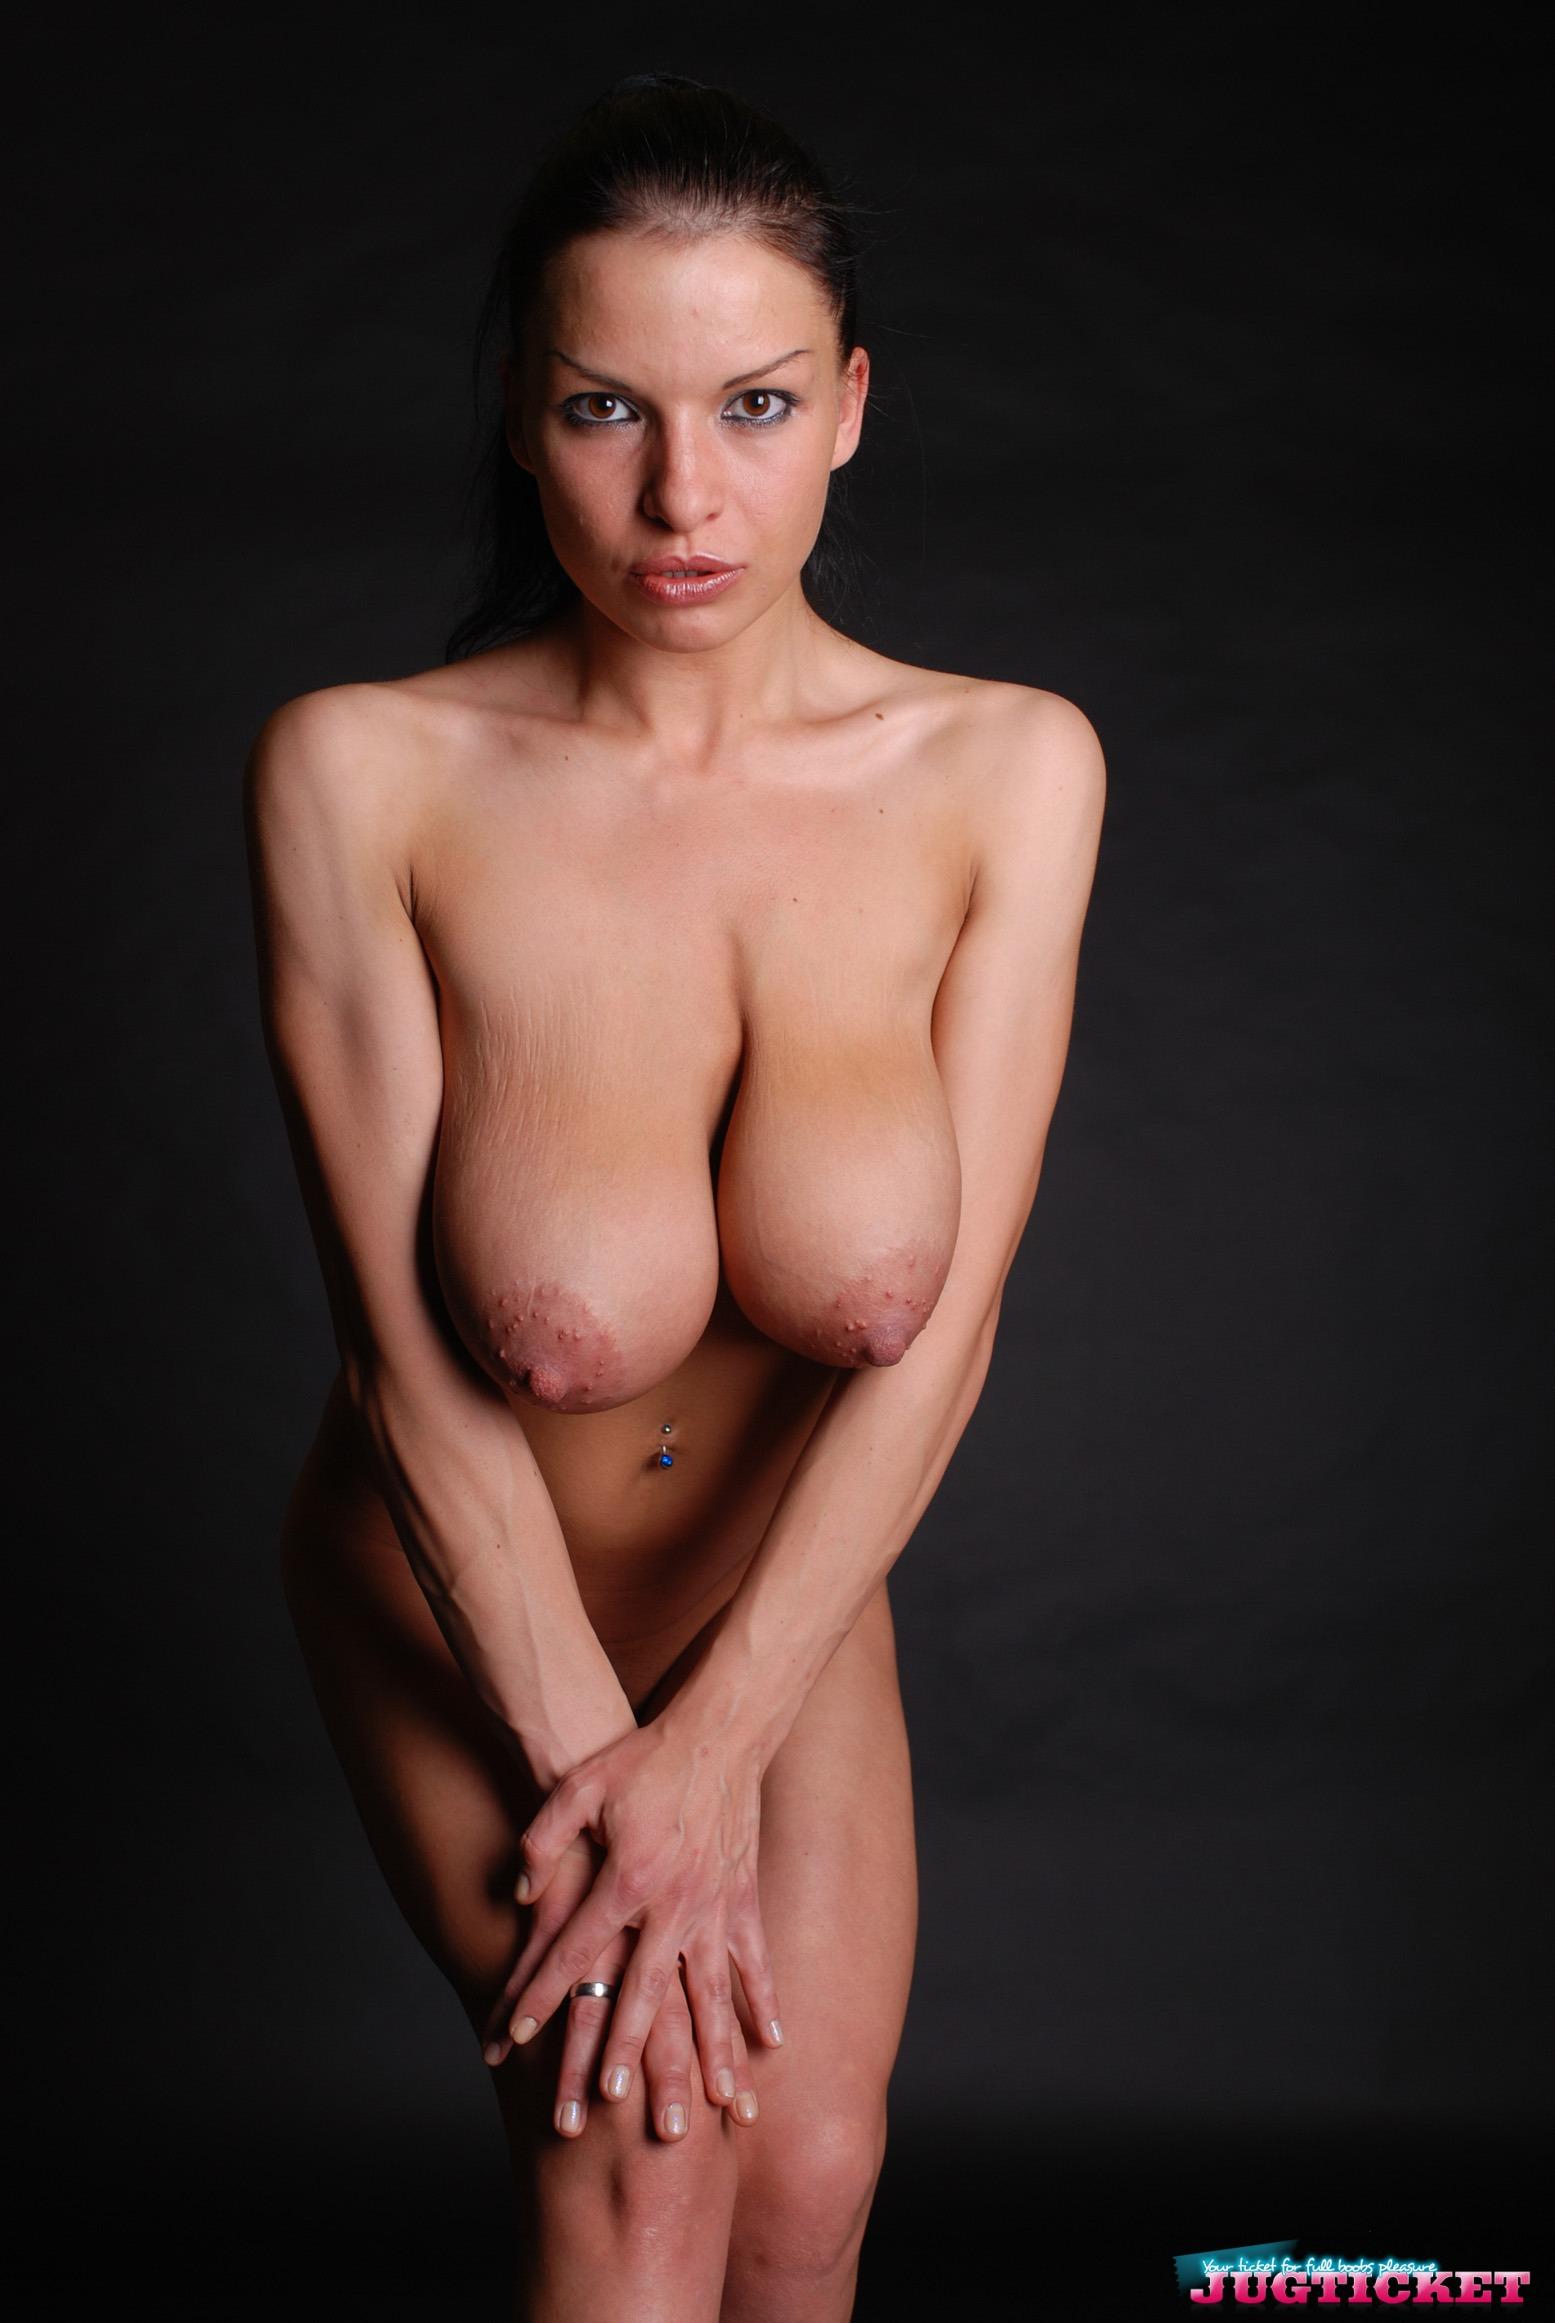 Consider, that Full frontal hard nipples